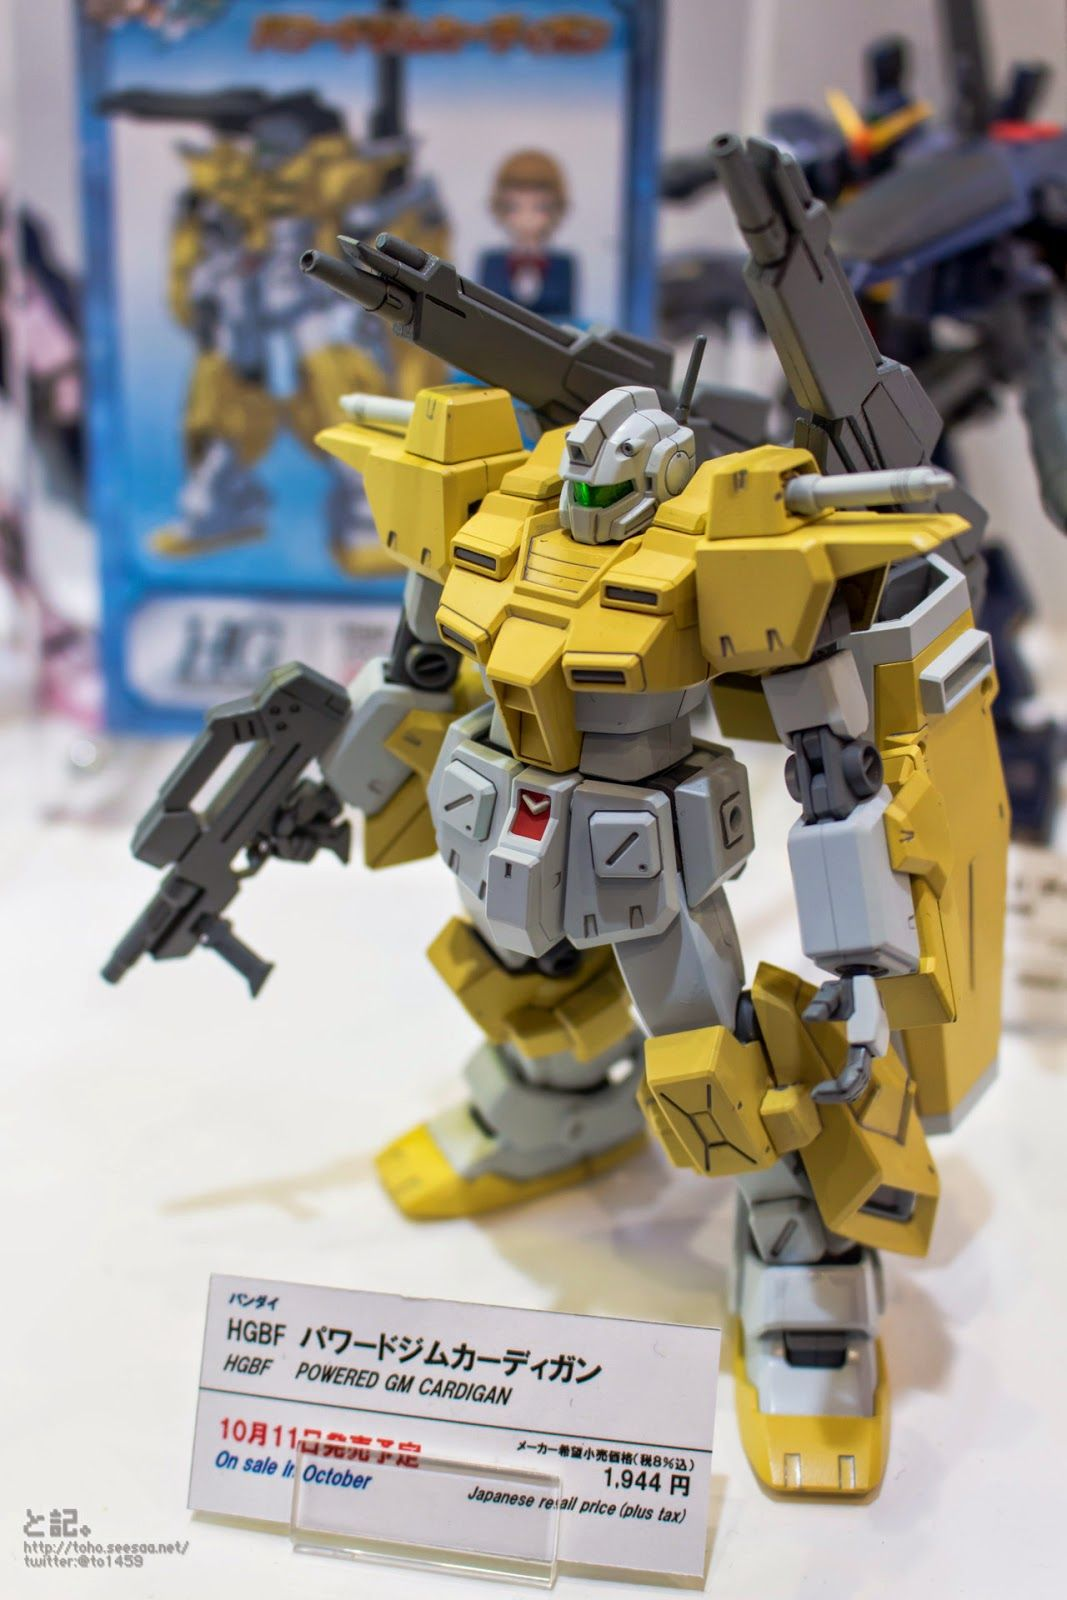 Hg 1 144 Powered Gm Cardigan On Display All Japan Model Hobby